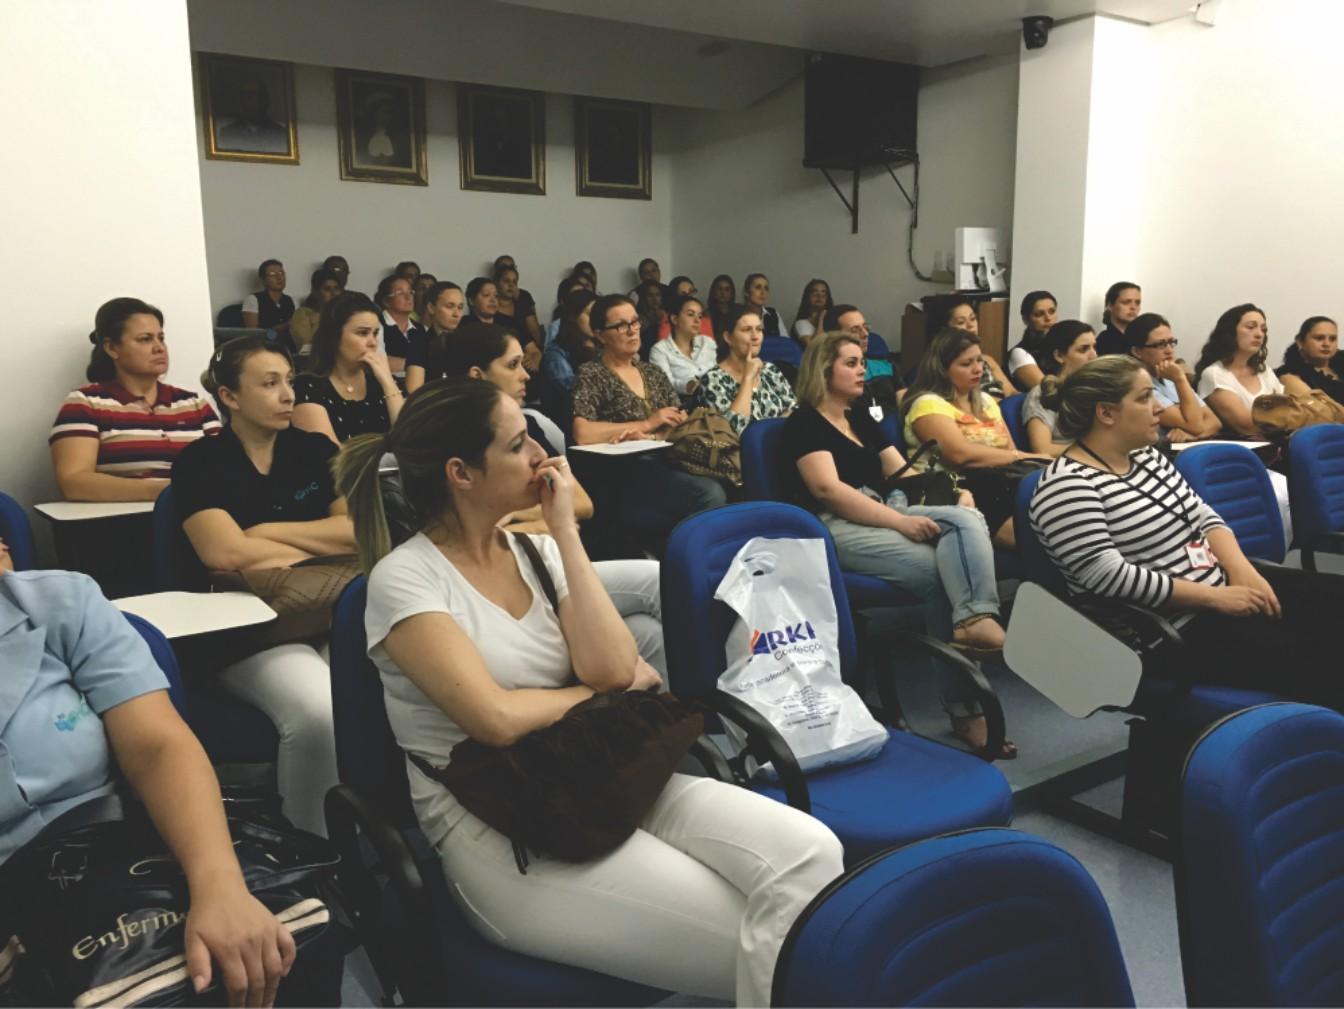 Armando Ribas   2016-07-26 09:28:16